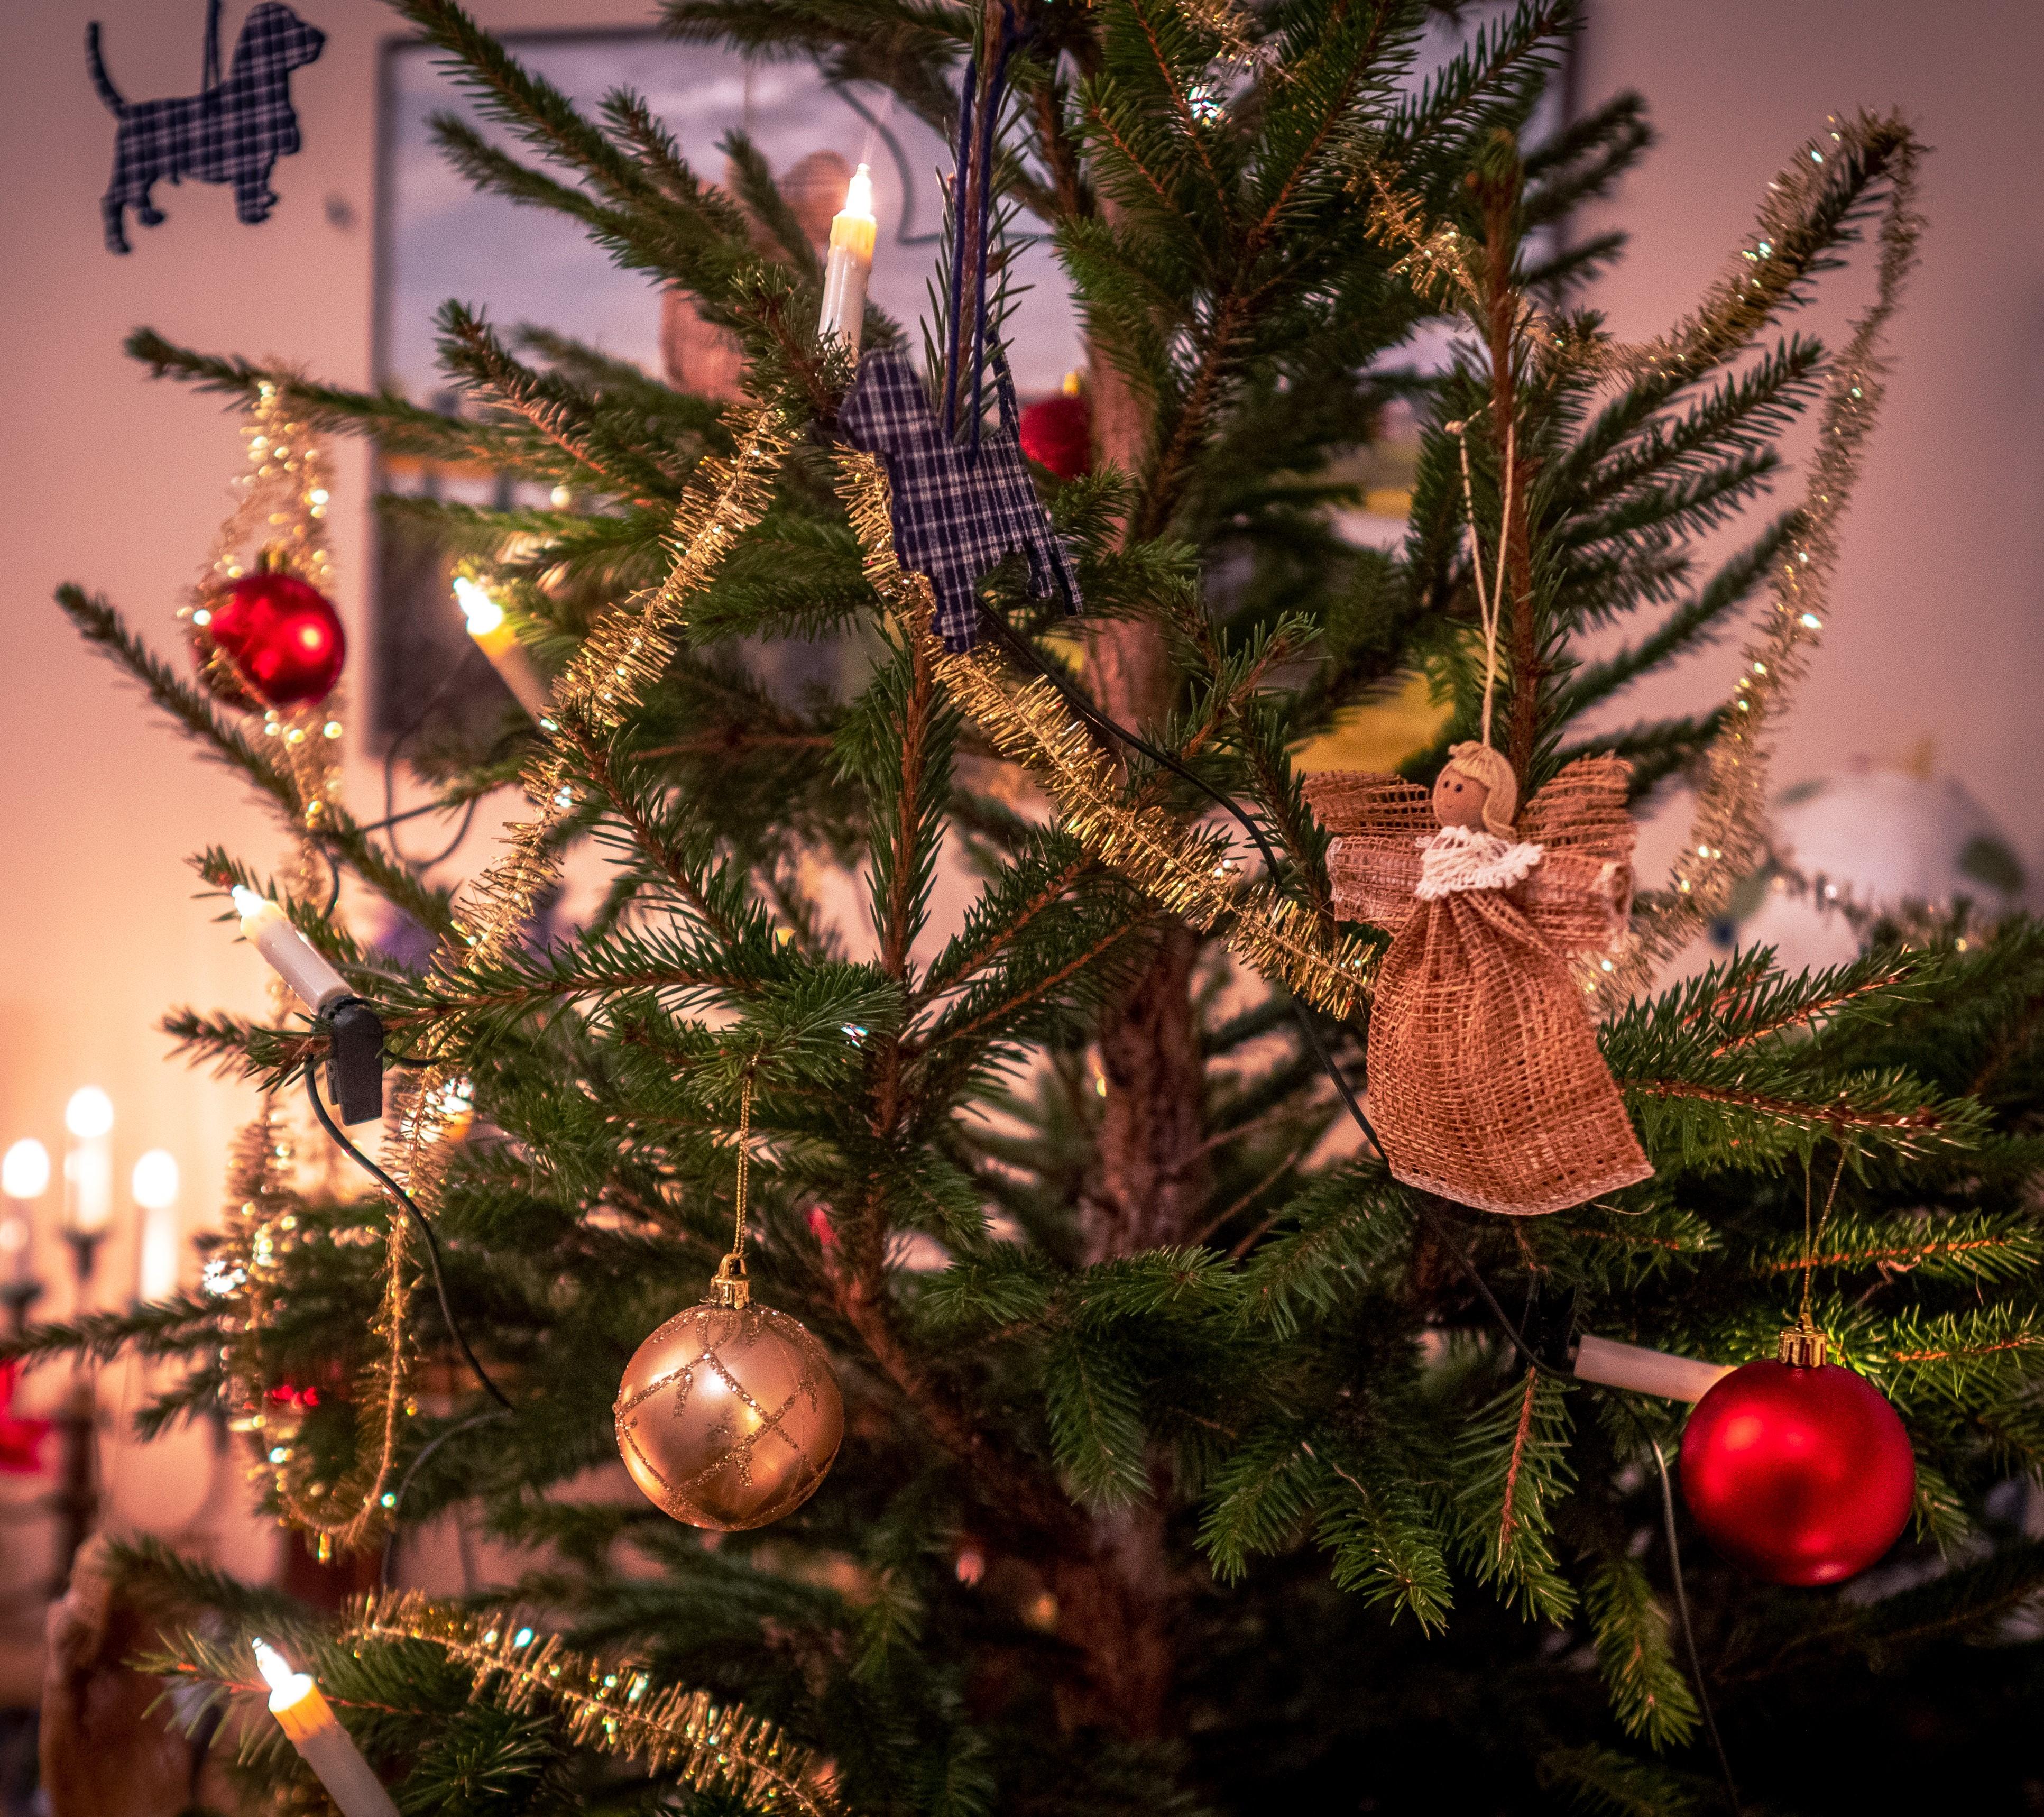 Joulukuusen koristeita. Tuukka Lindholm.